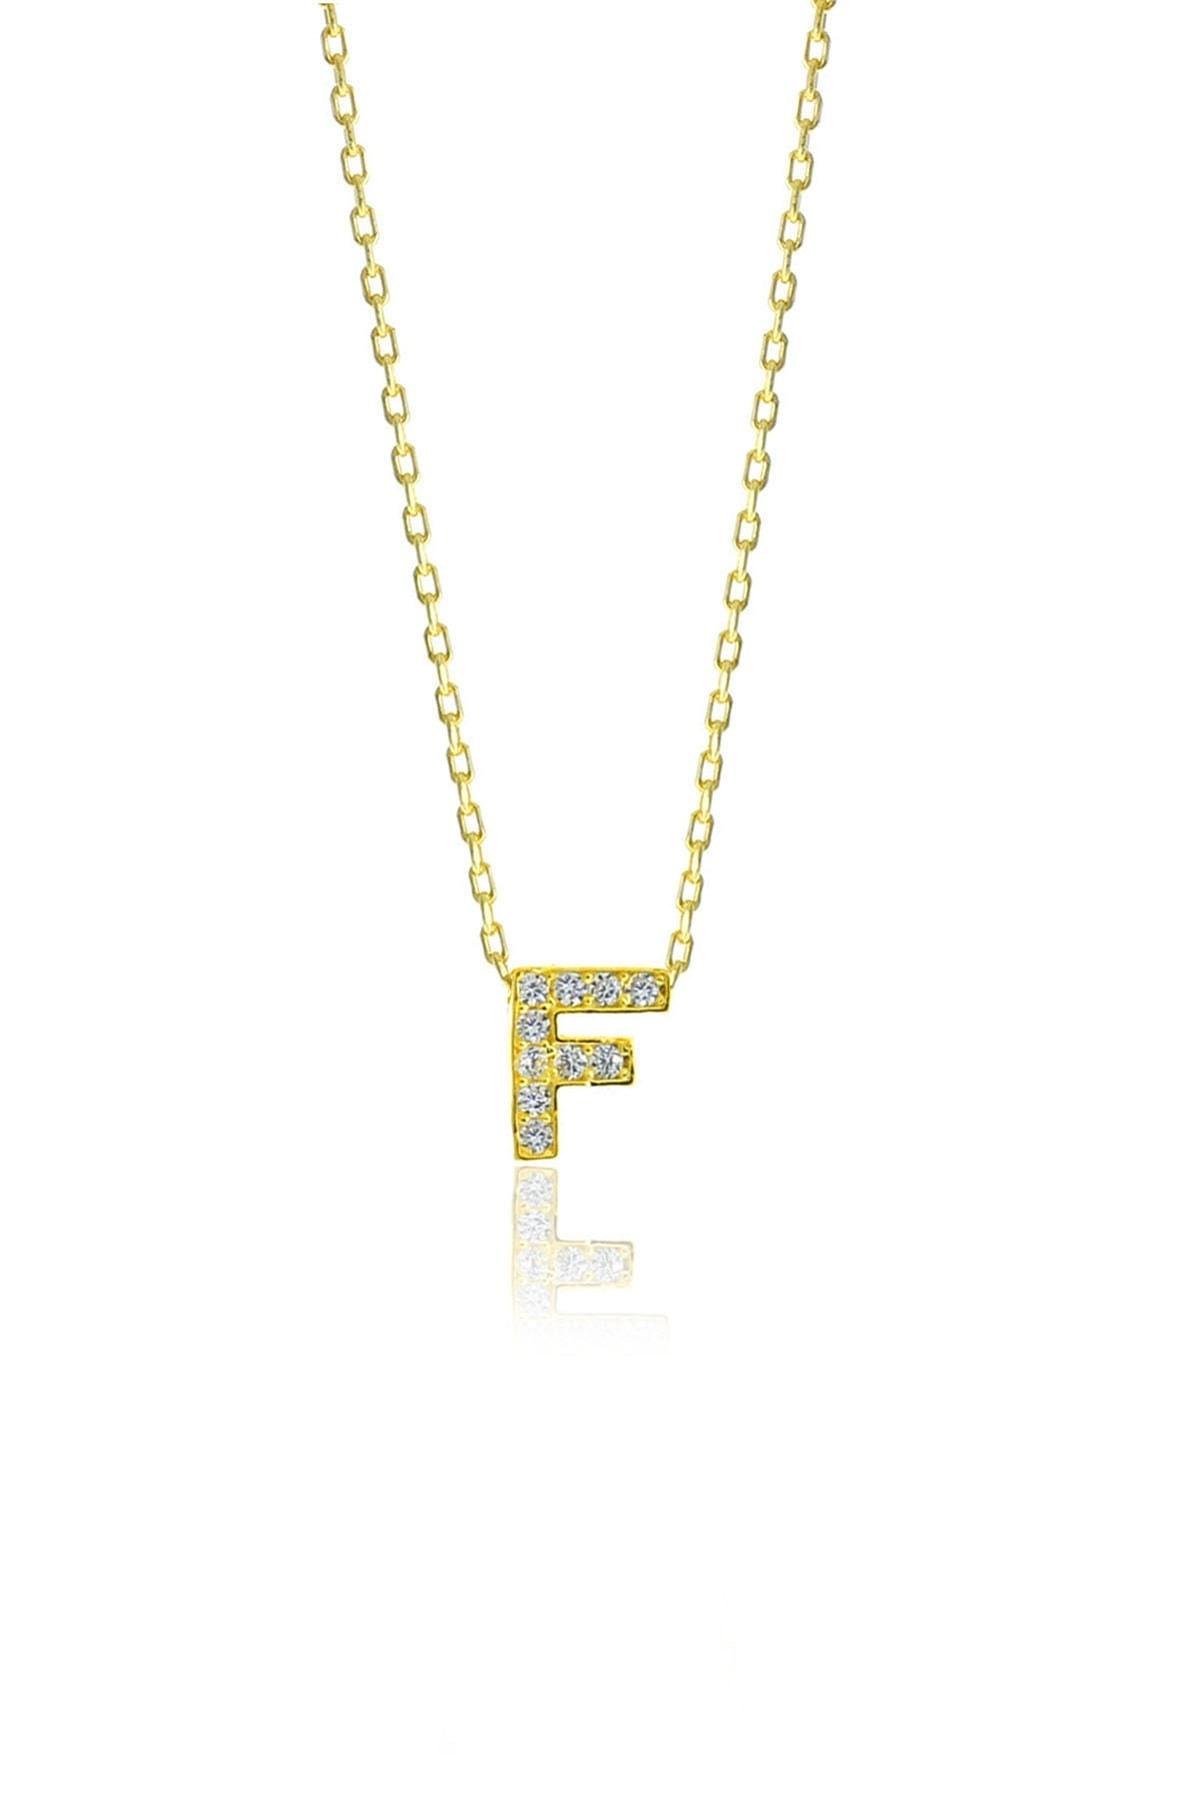 Gümüş  Altın Yaldızlı Üç Boyutlu Minimal F Gümüş Harf Kolye